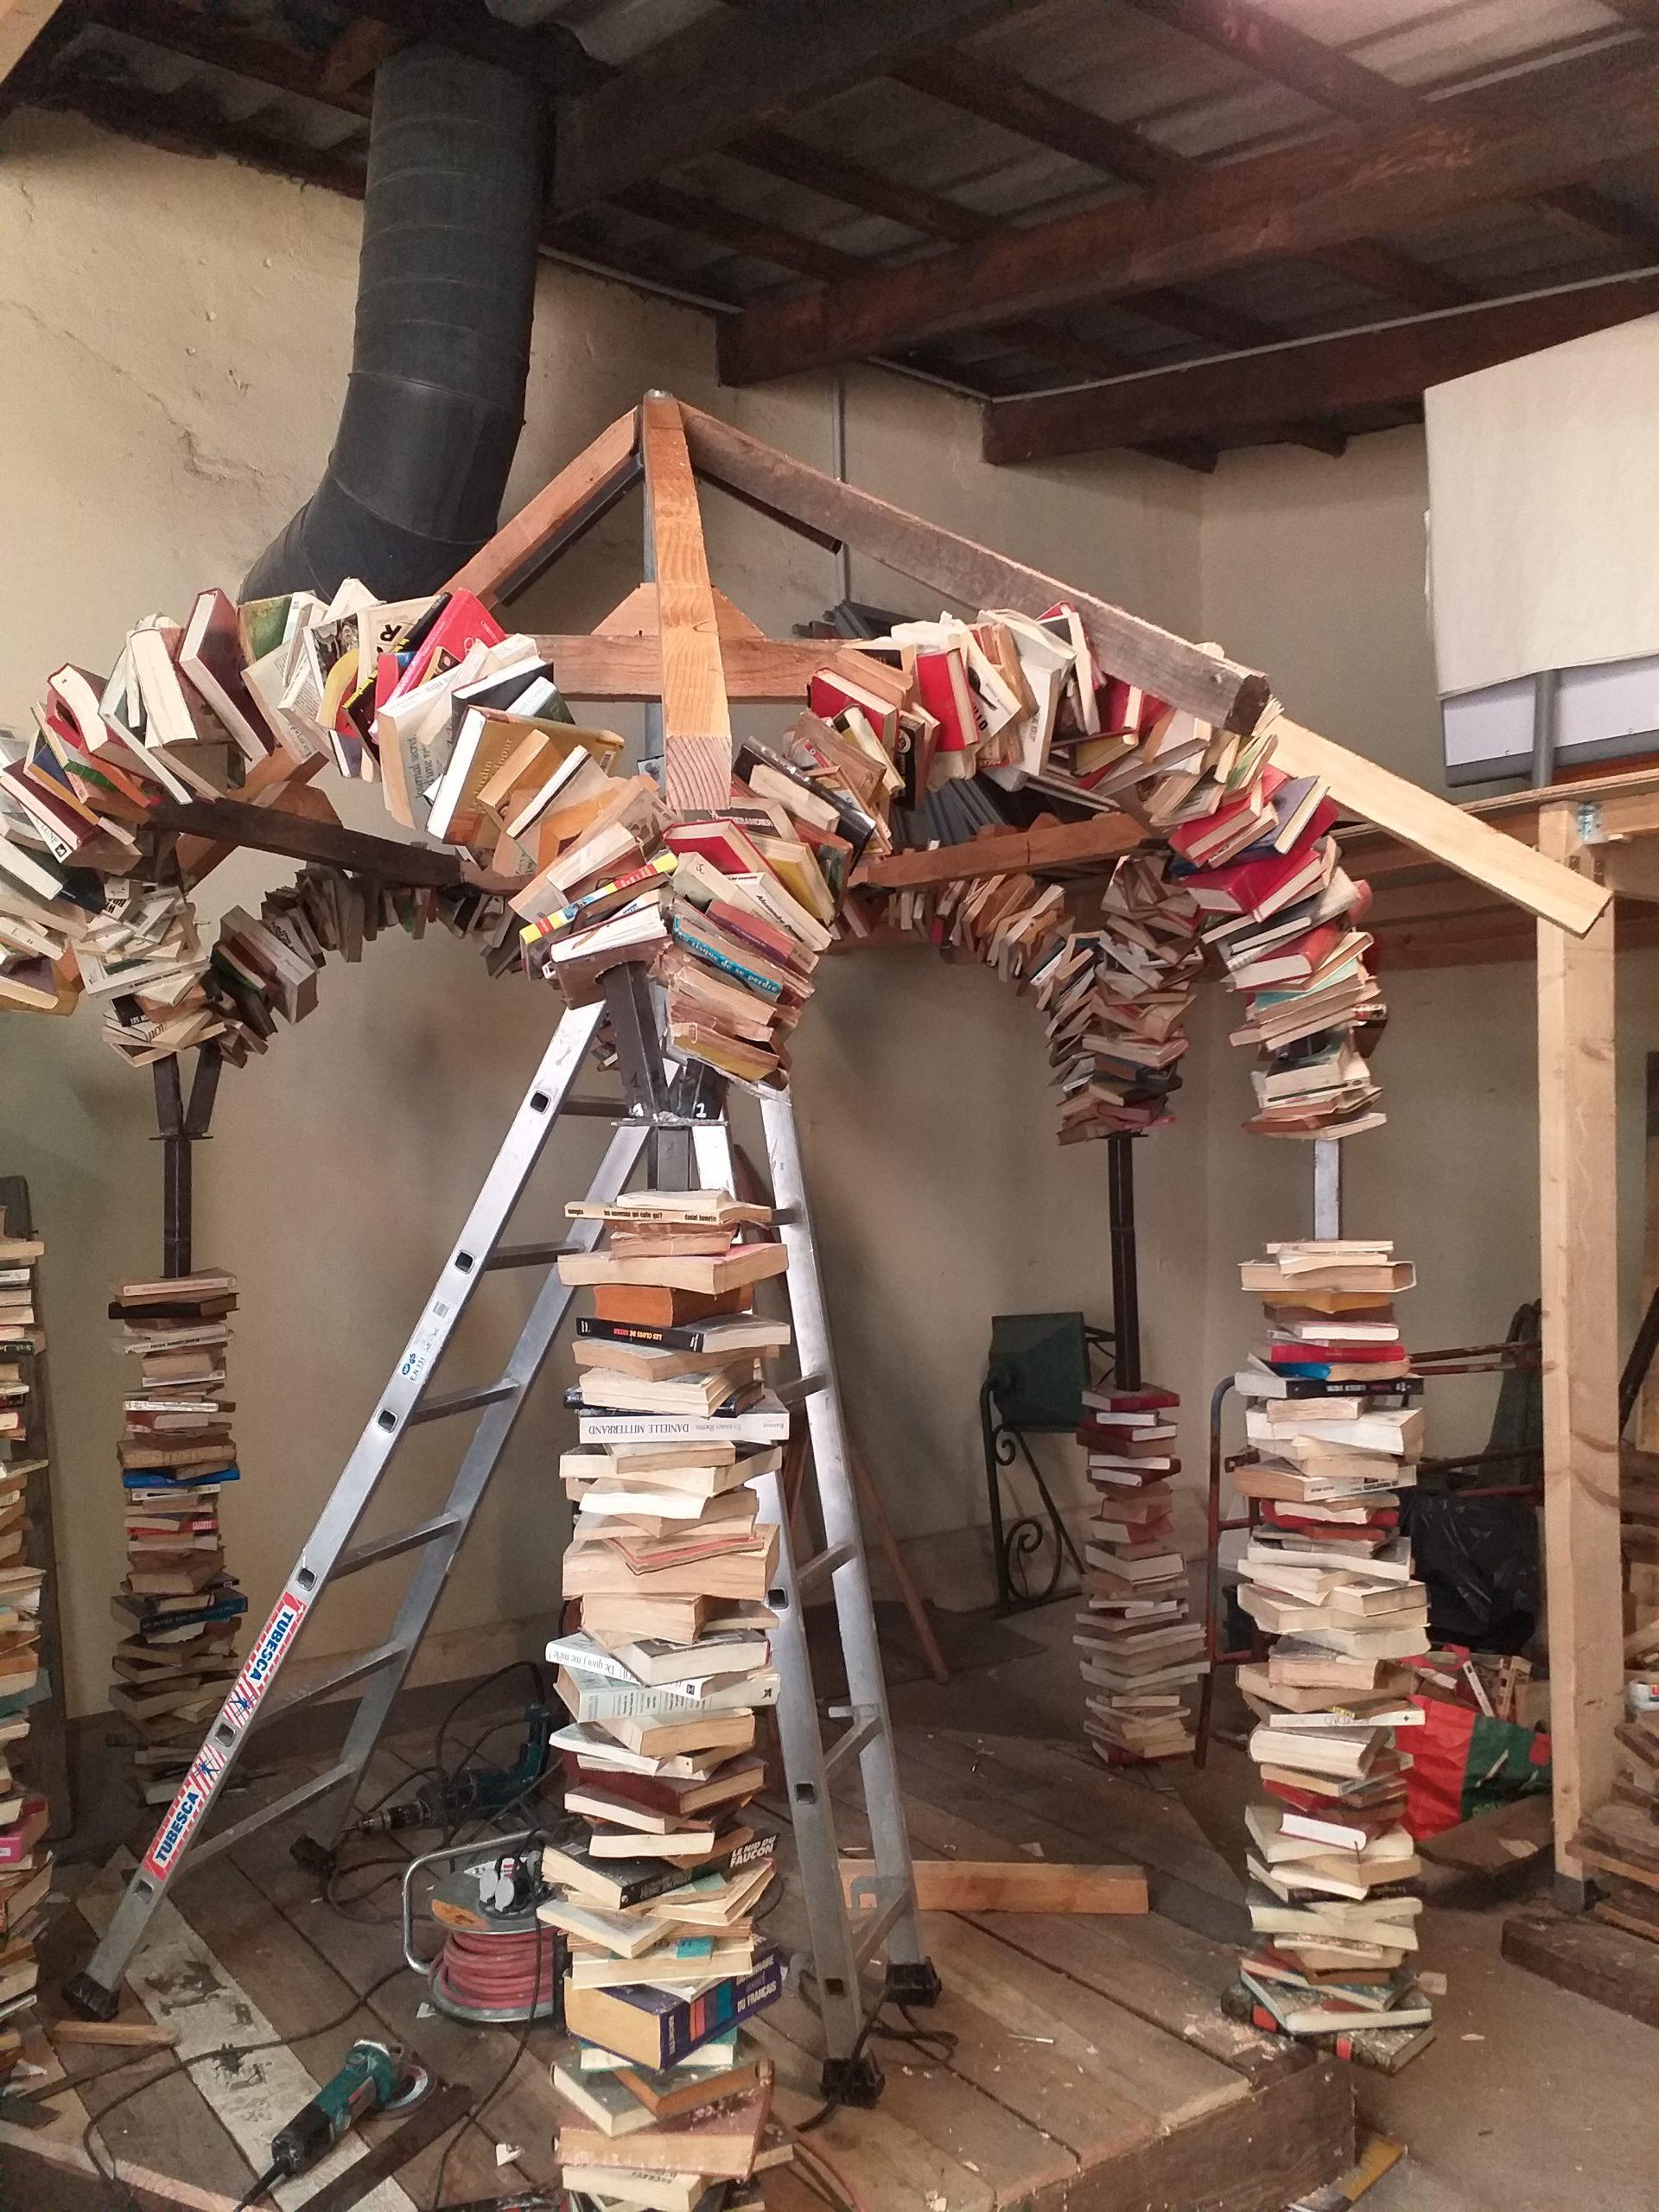 kiosque à livres